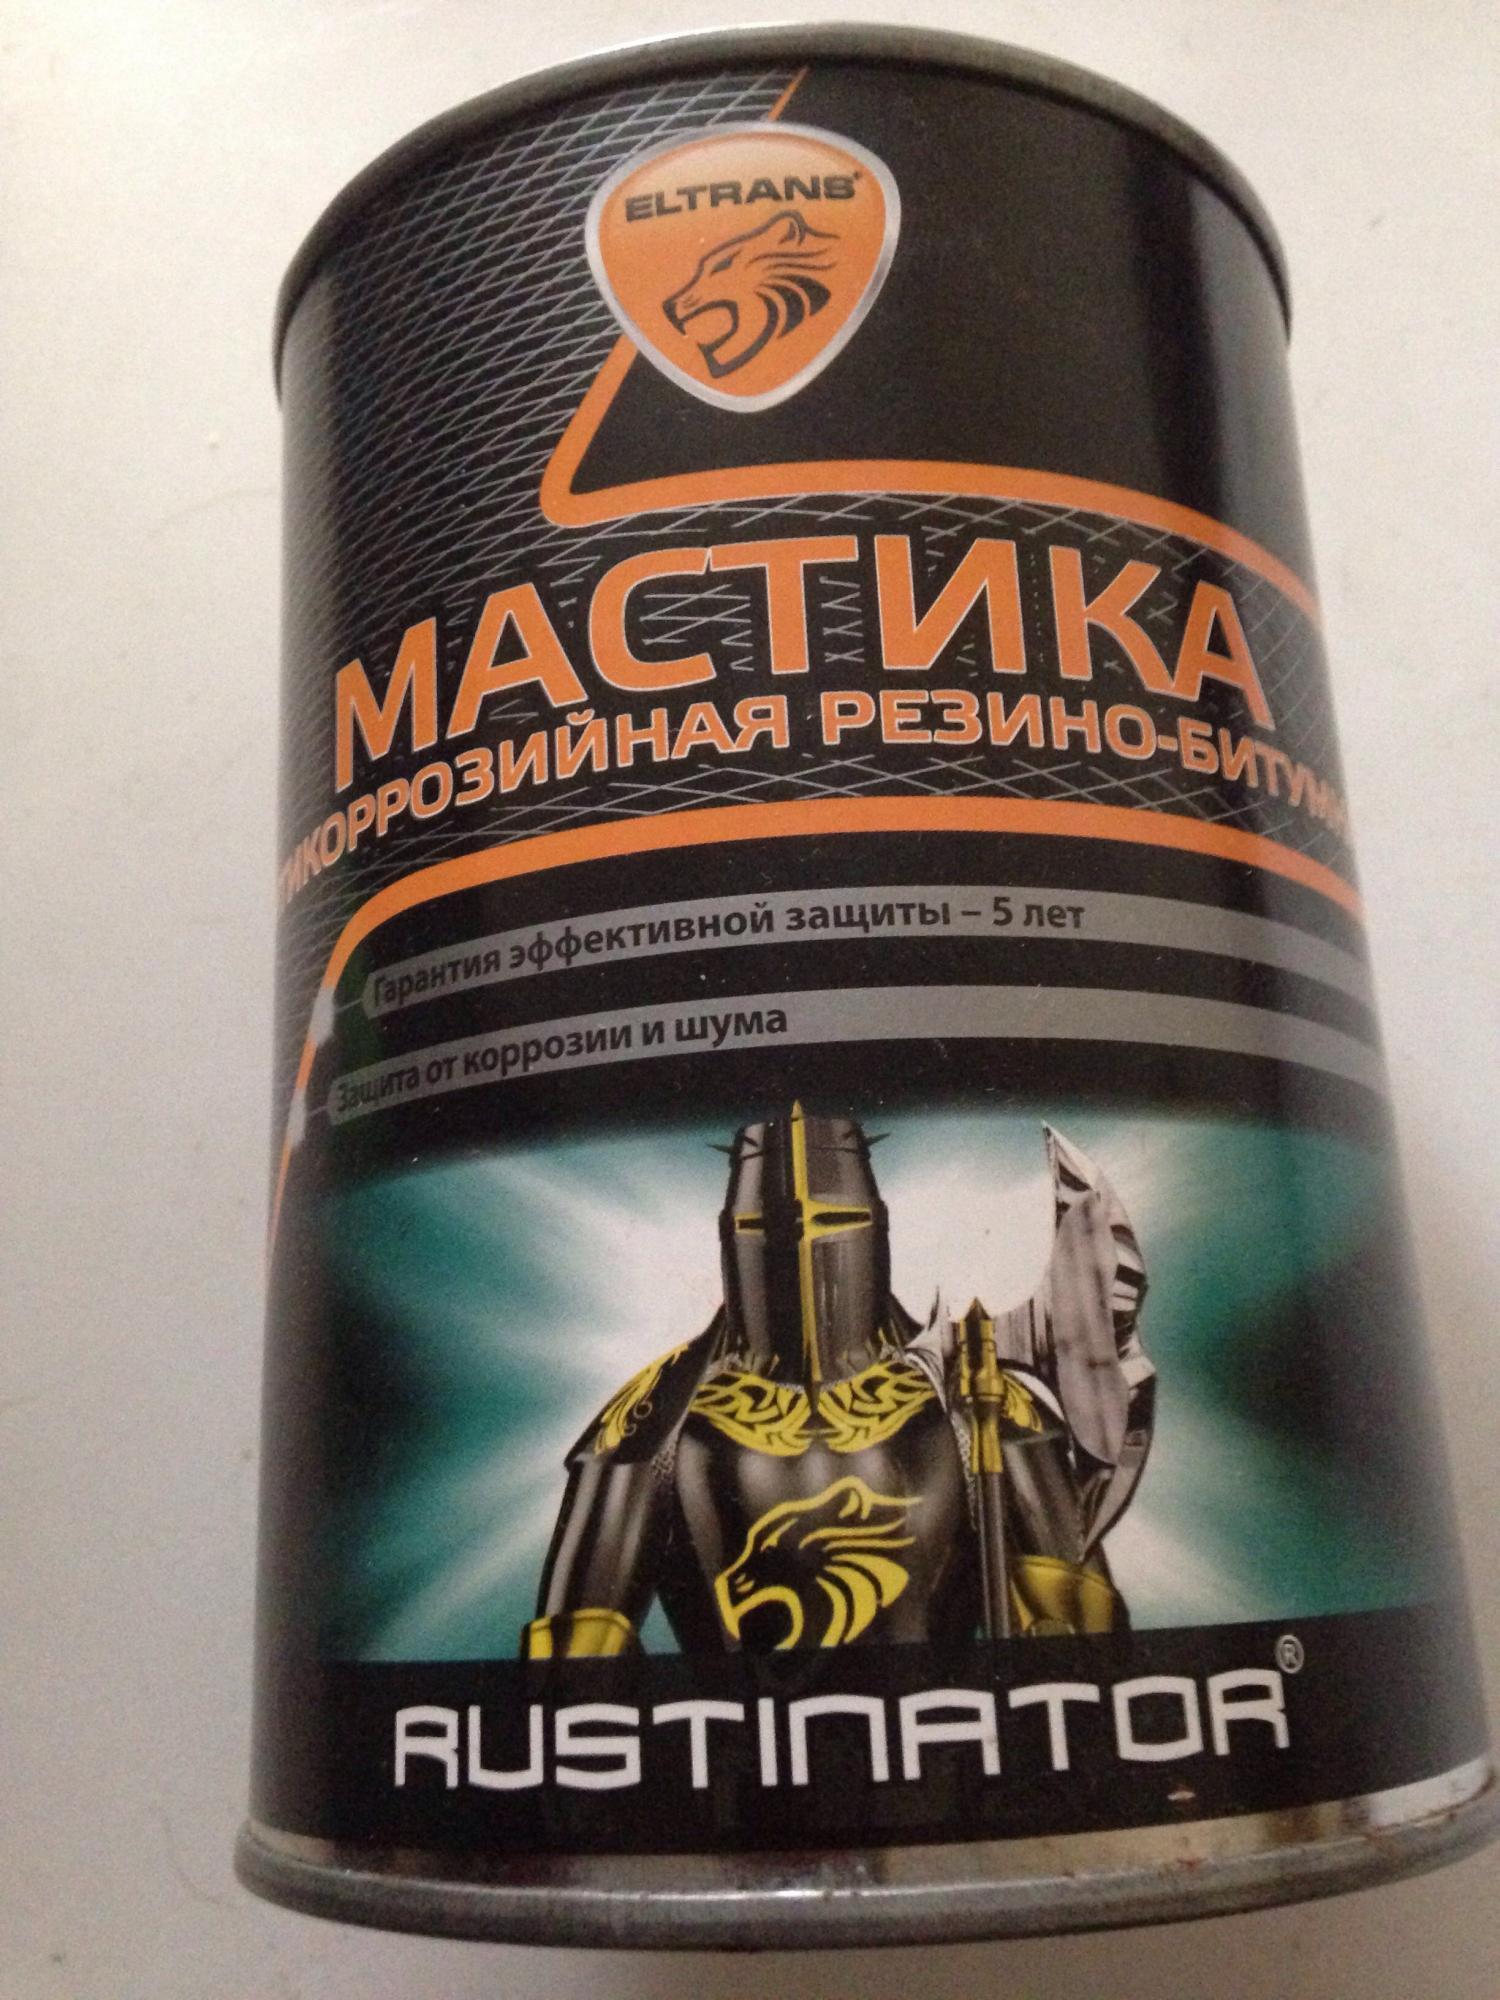 Мастика антикоррозийная резино-битумная БМП-3 в Москве